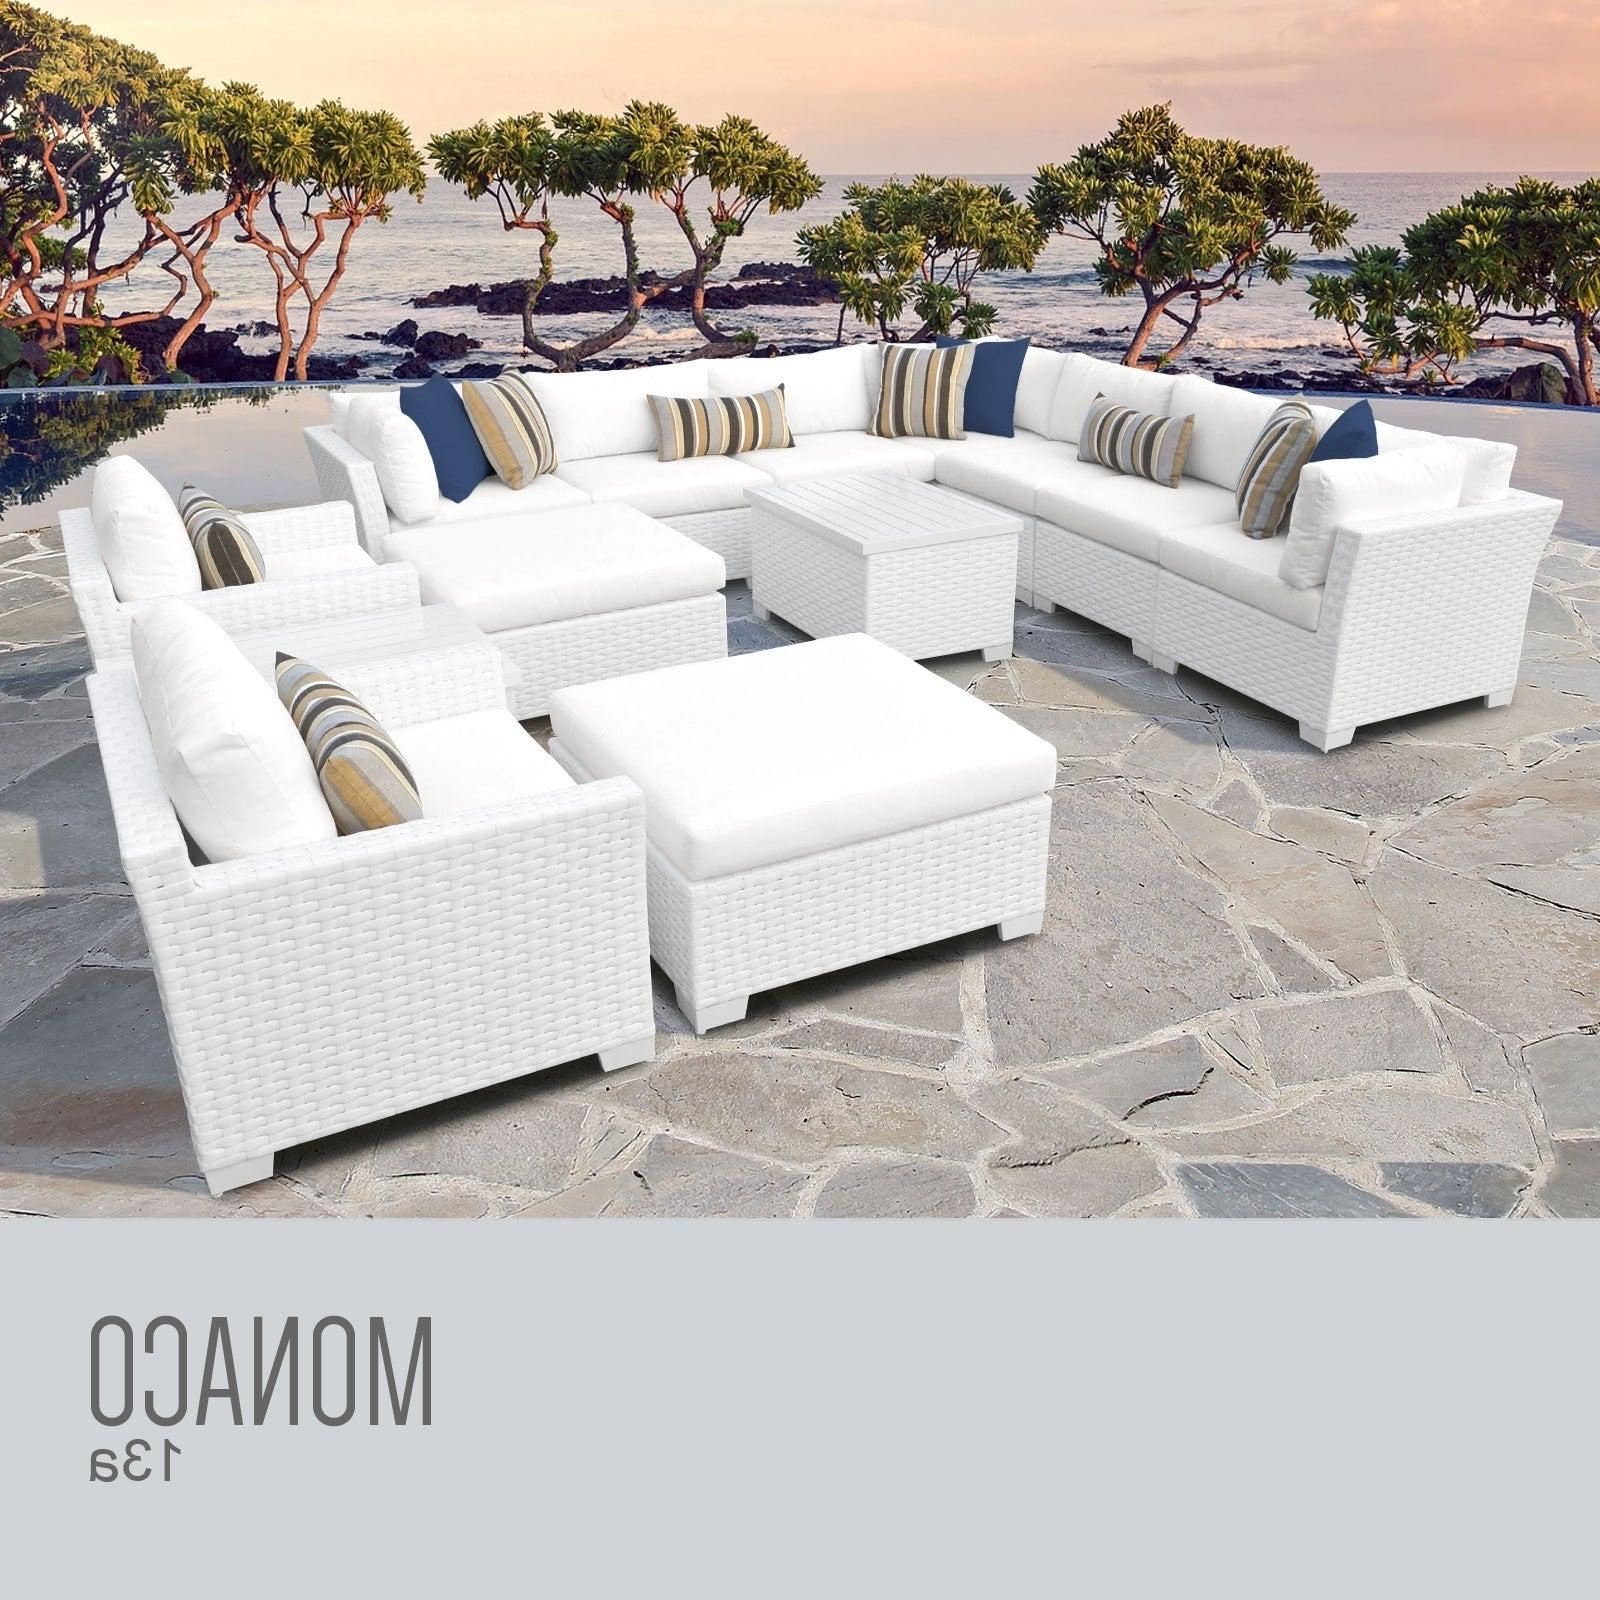 Recent Monaco 13 Piece Outdoor Wicker Patio Furniture Set 13A For Outdoor 13 Piece Wicker Patio Sets With Cushions (View 21 of 25)